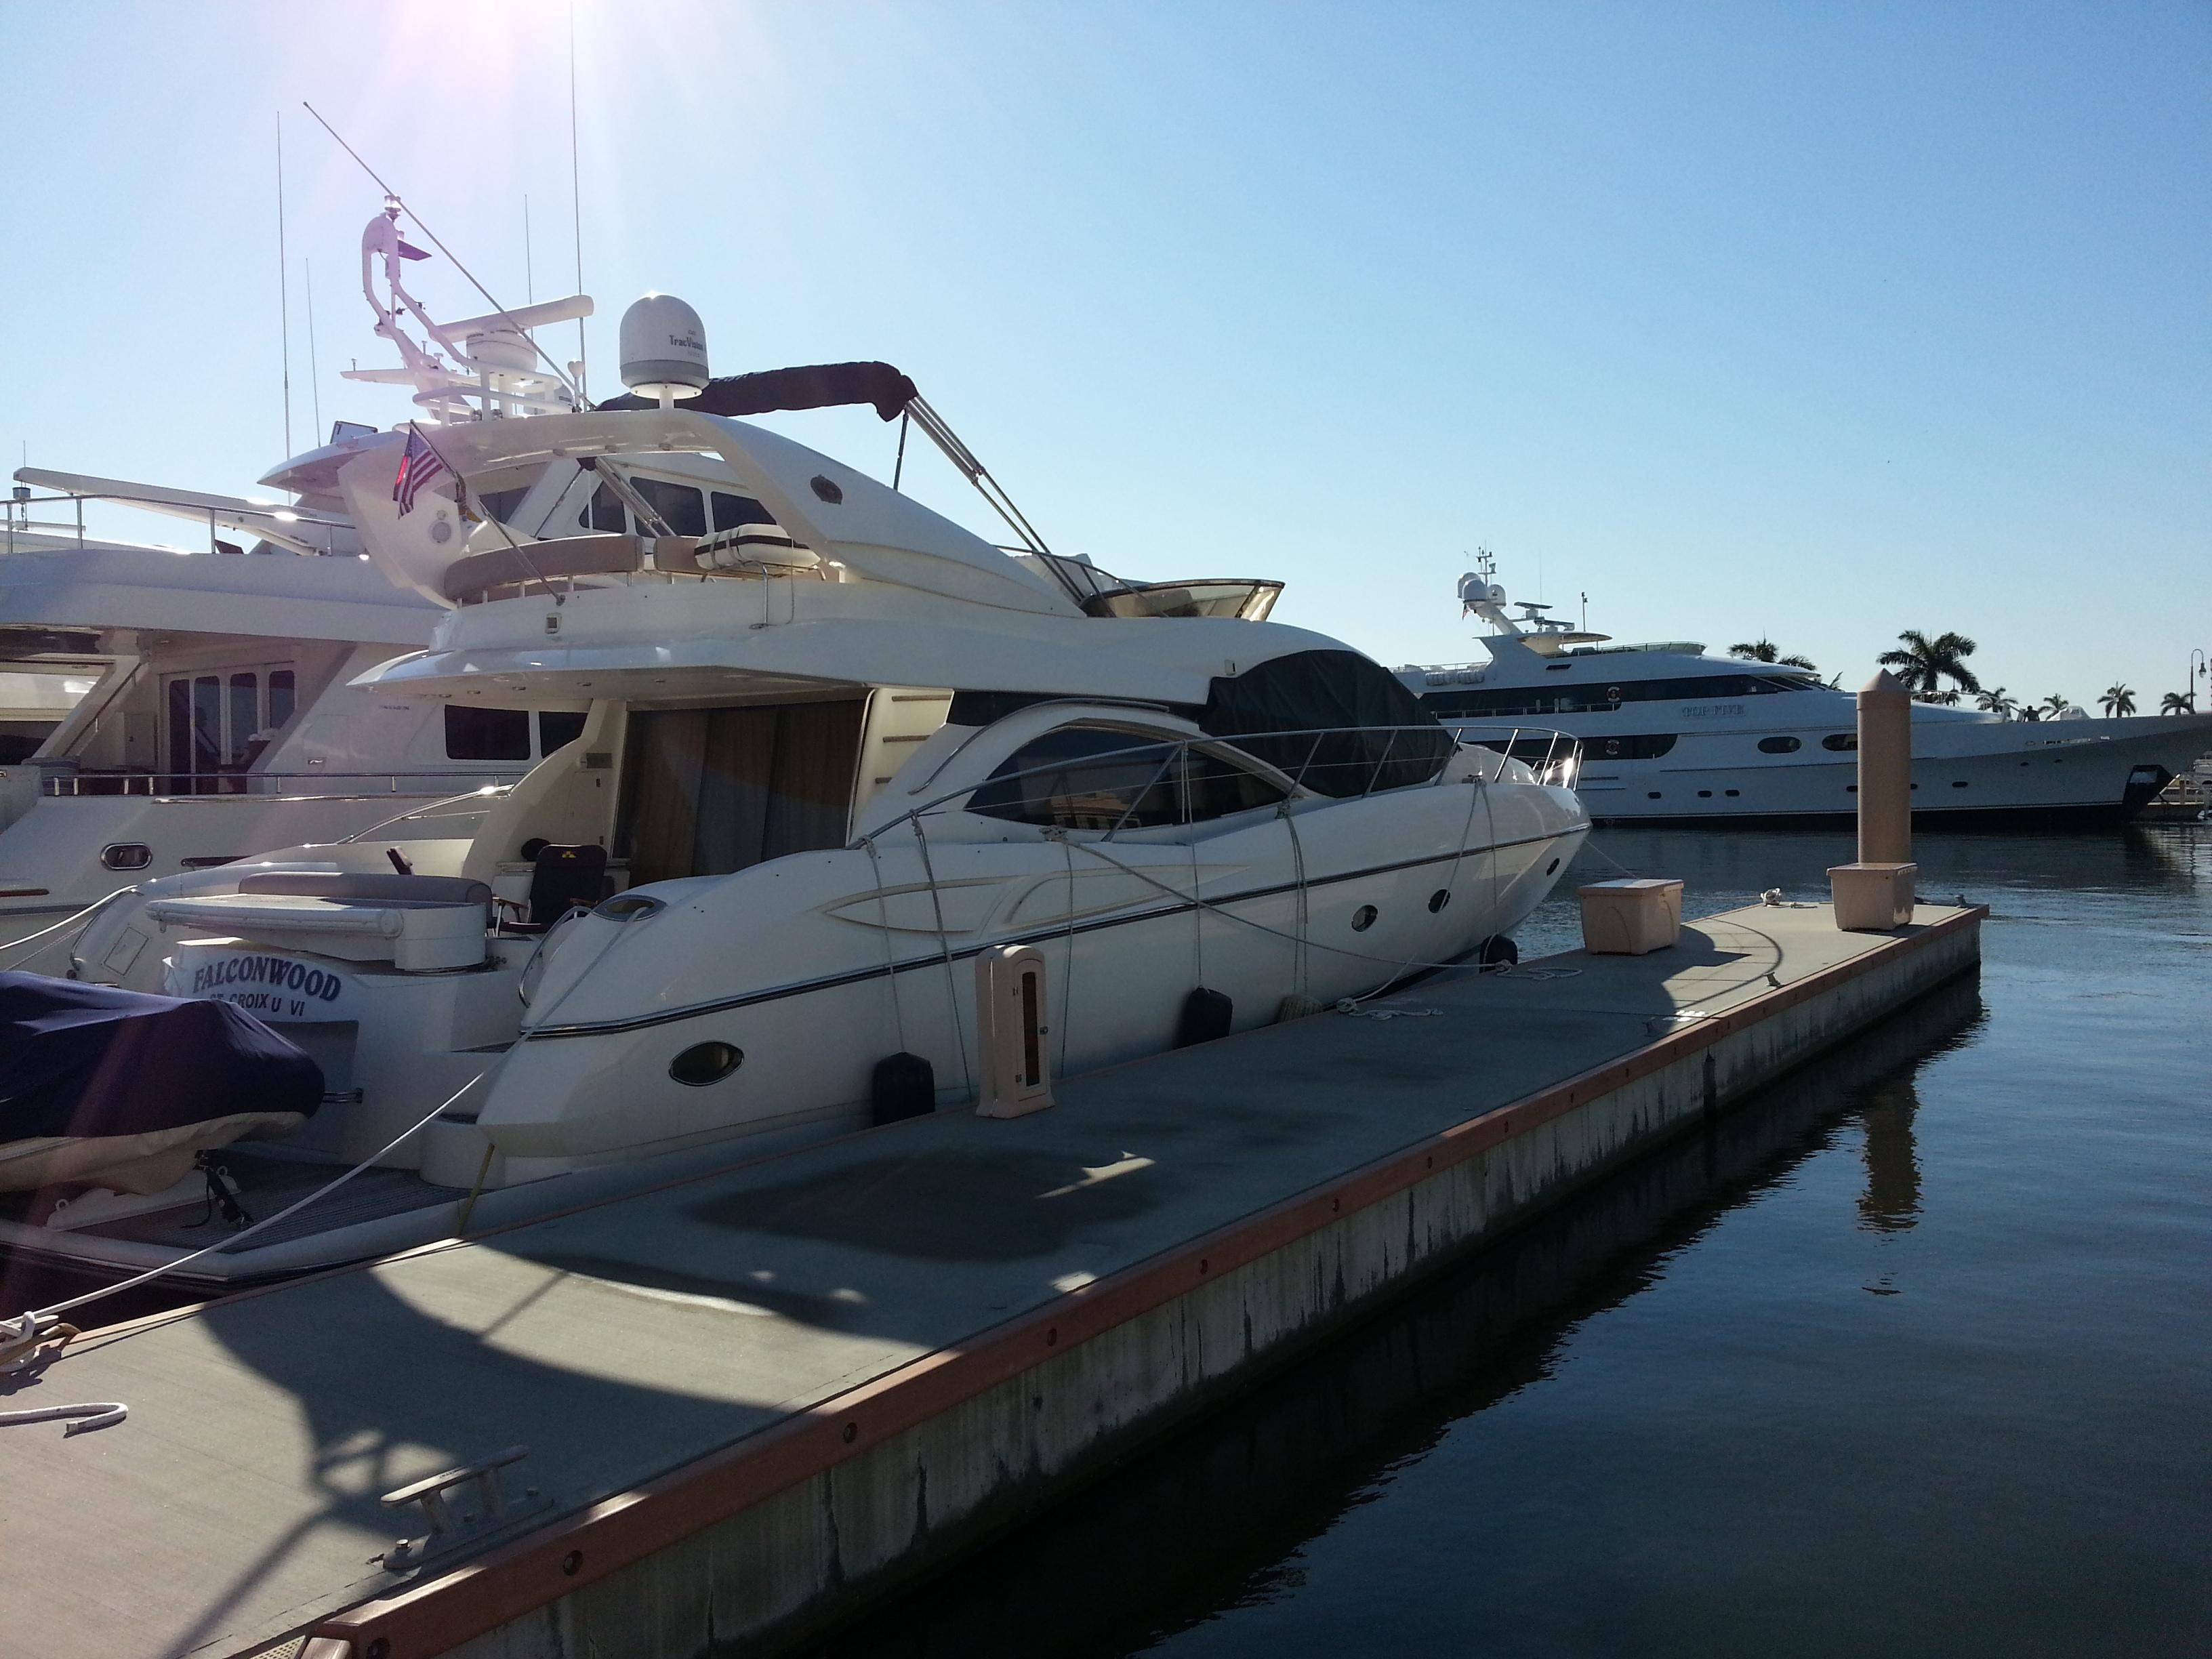 Marina Used Boats Michigan Happy Memorial Day 2014